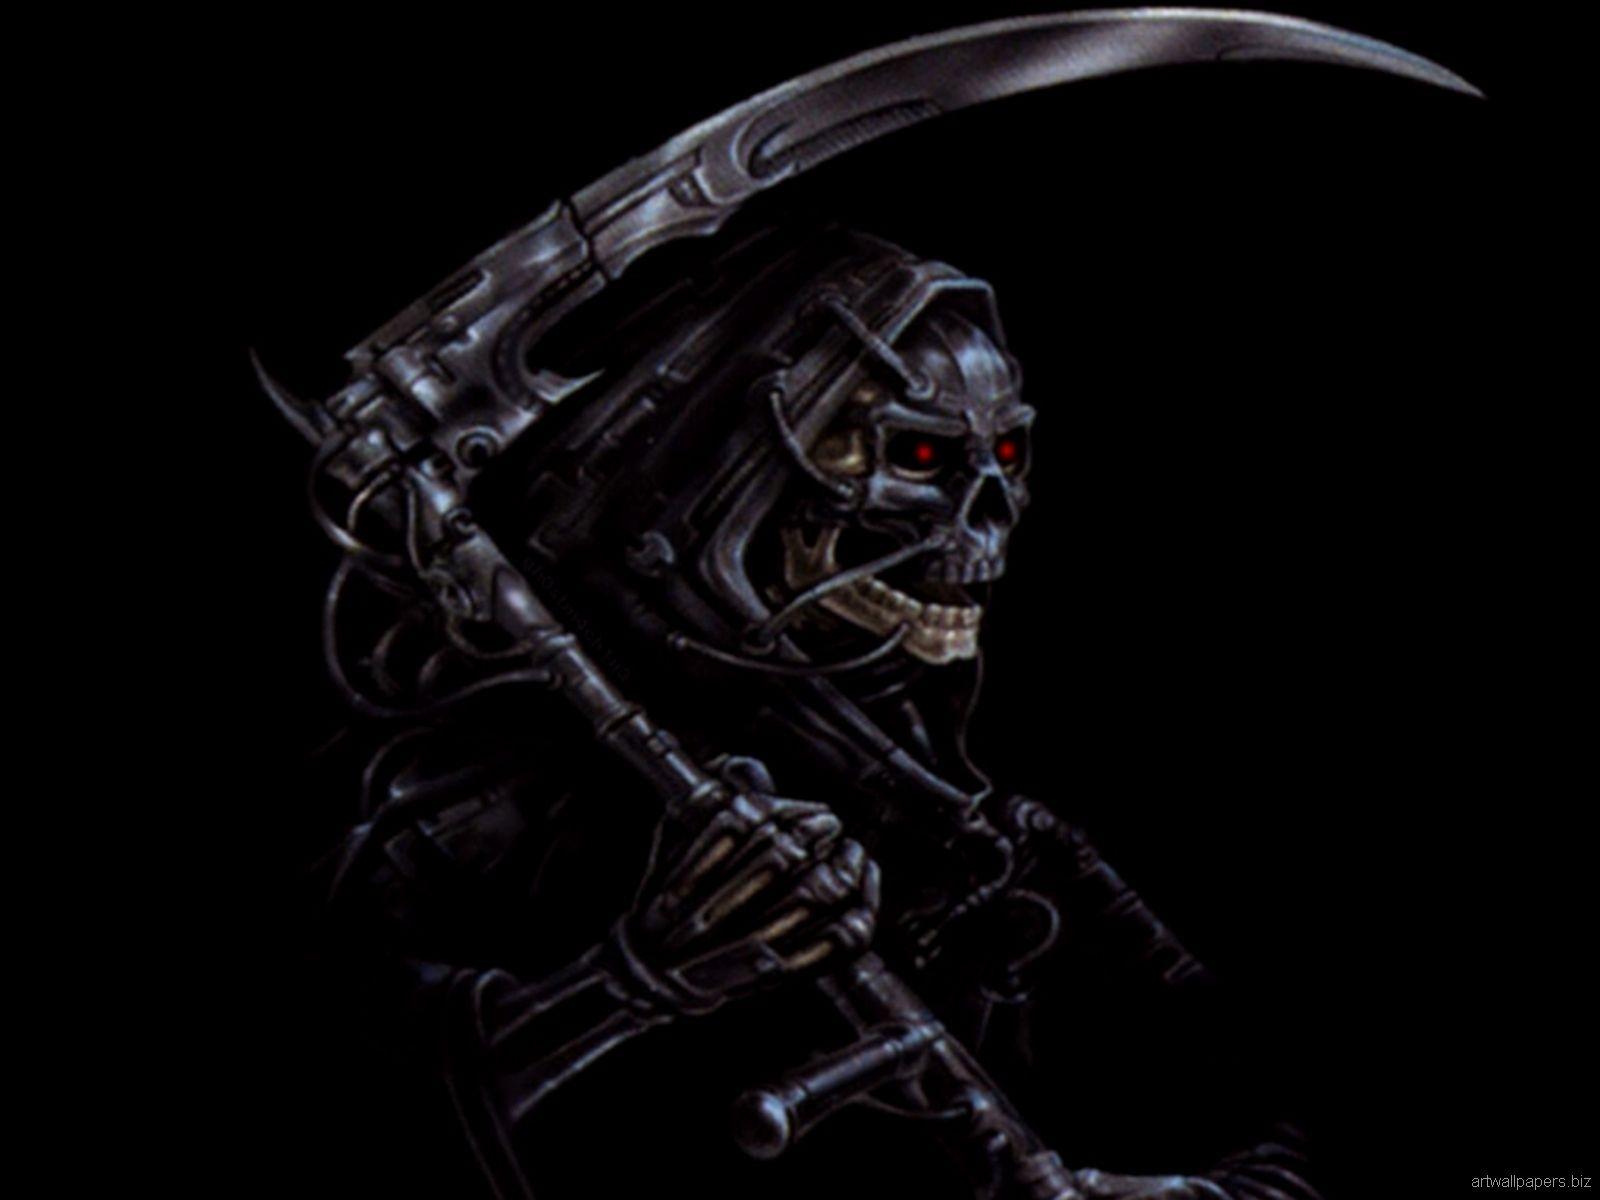 Skull 3d Wallpaper: Download 3D Skull Wallpaper Wide #1w2 • NgepLuk.com